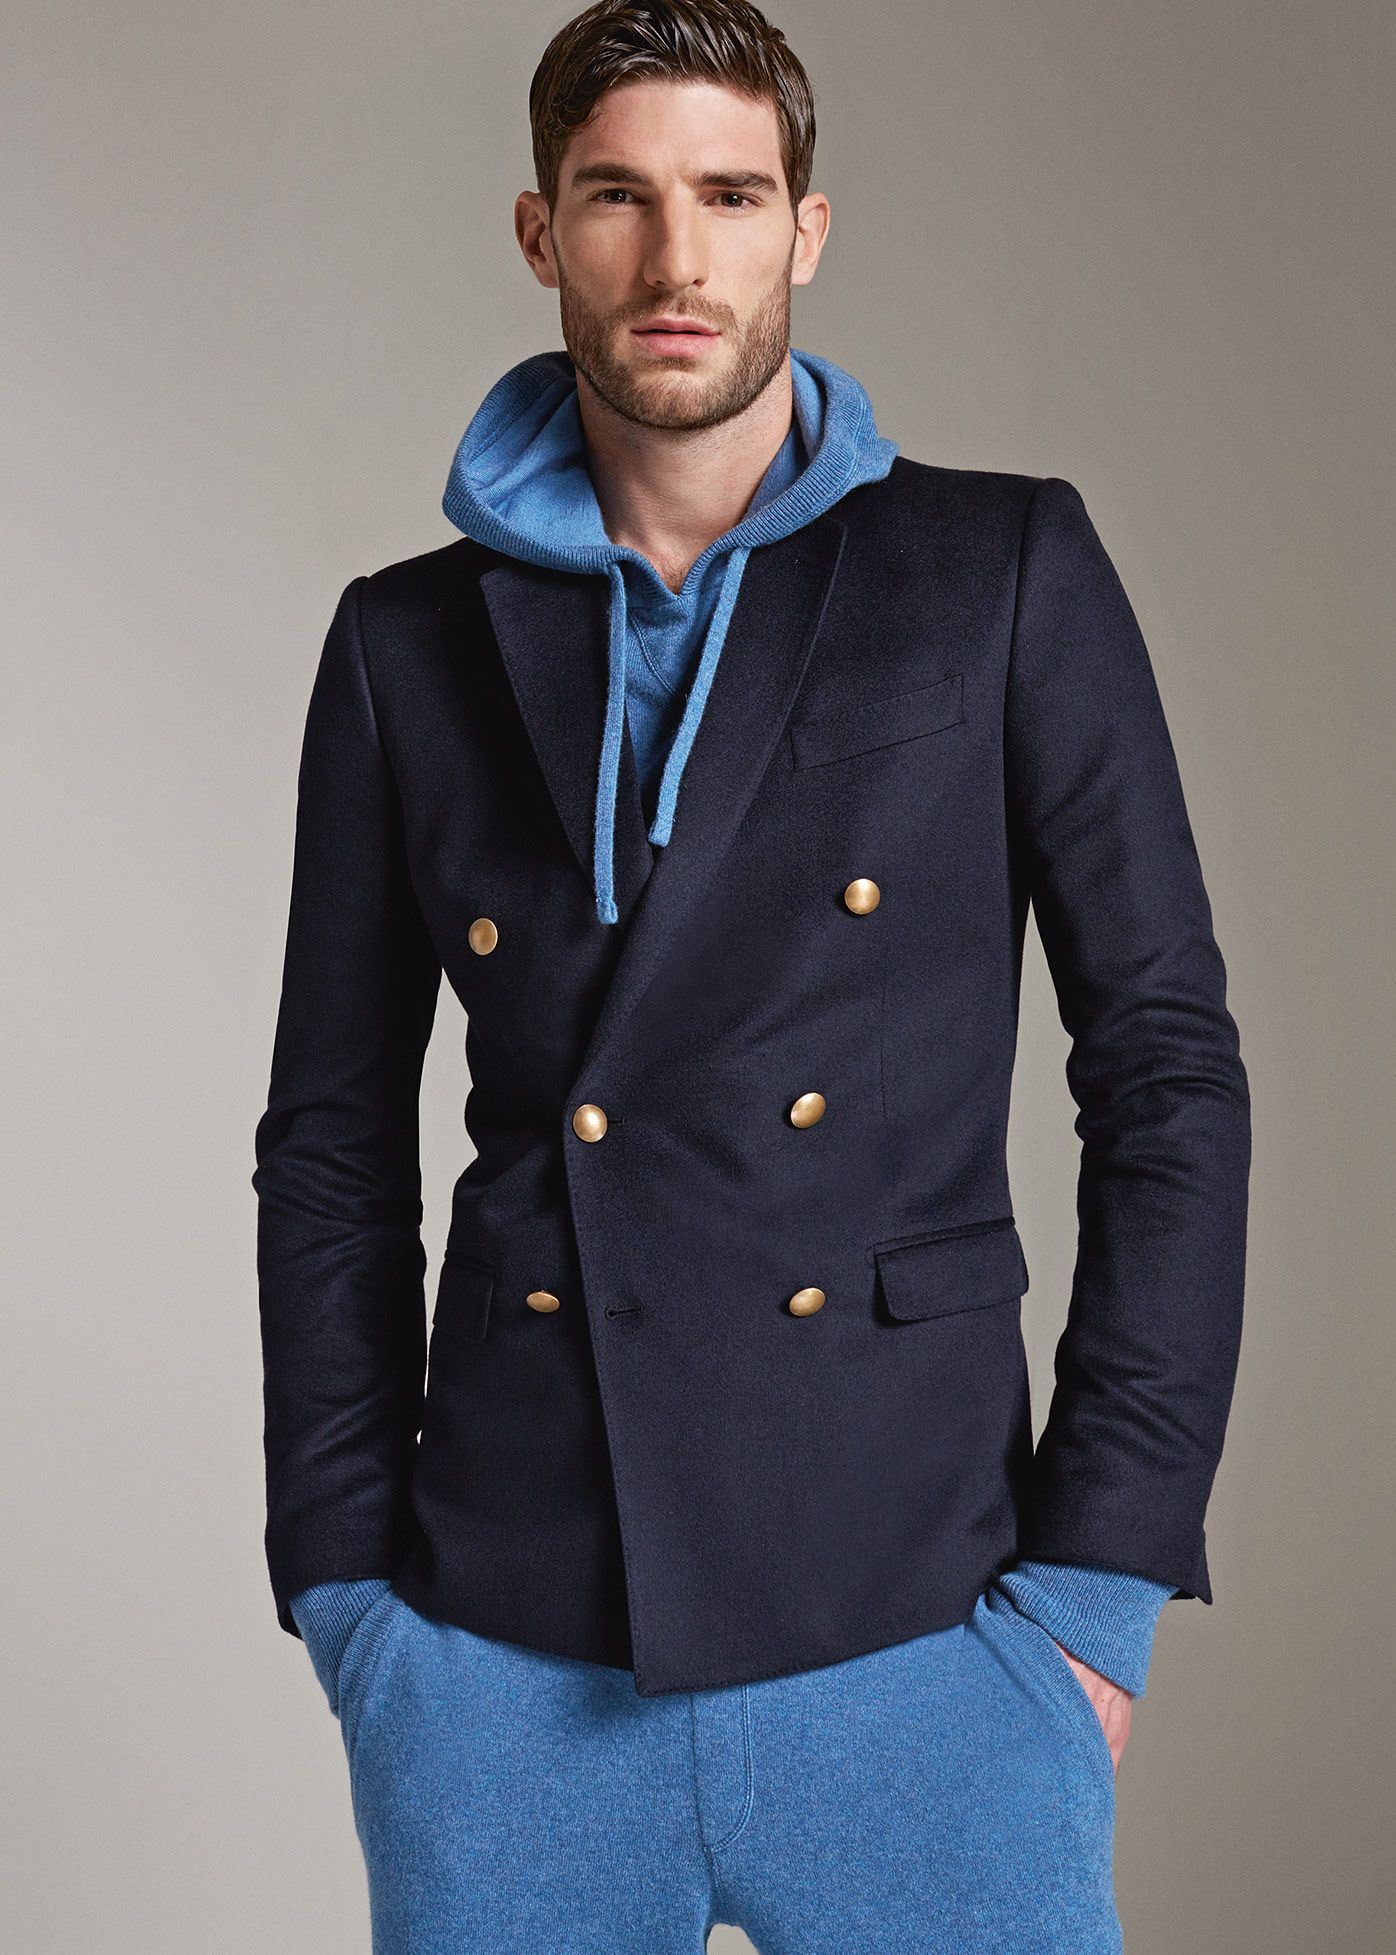 dd0e4cc8a7c2 Dolce   Gabbana Men s Clothing Collection Winter 2016